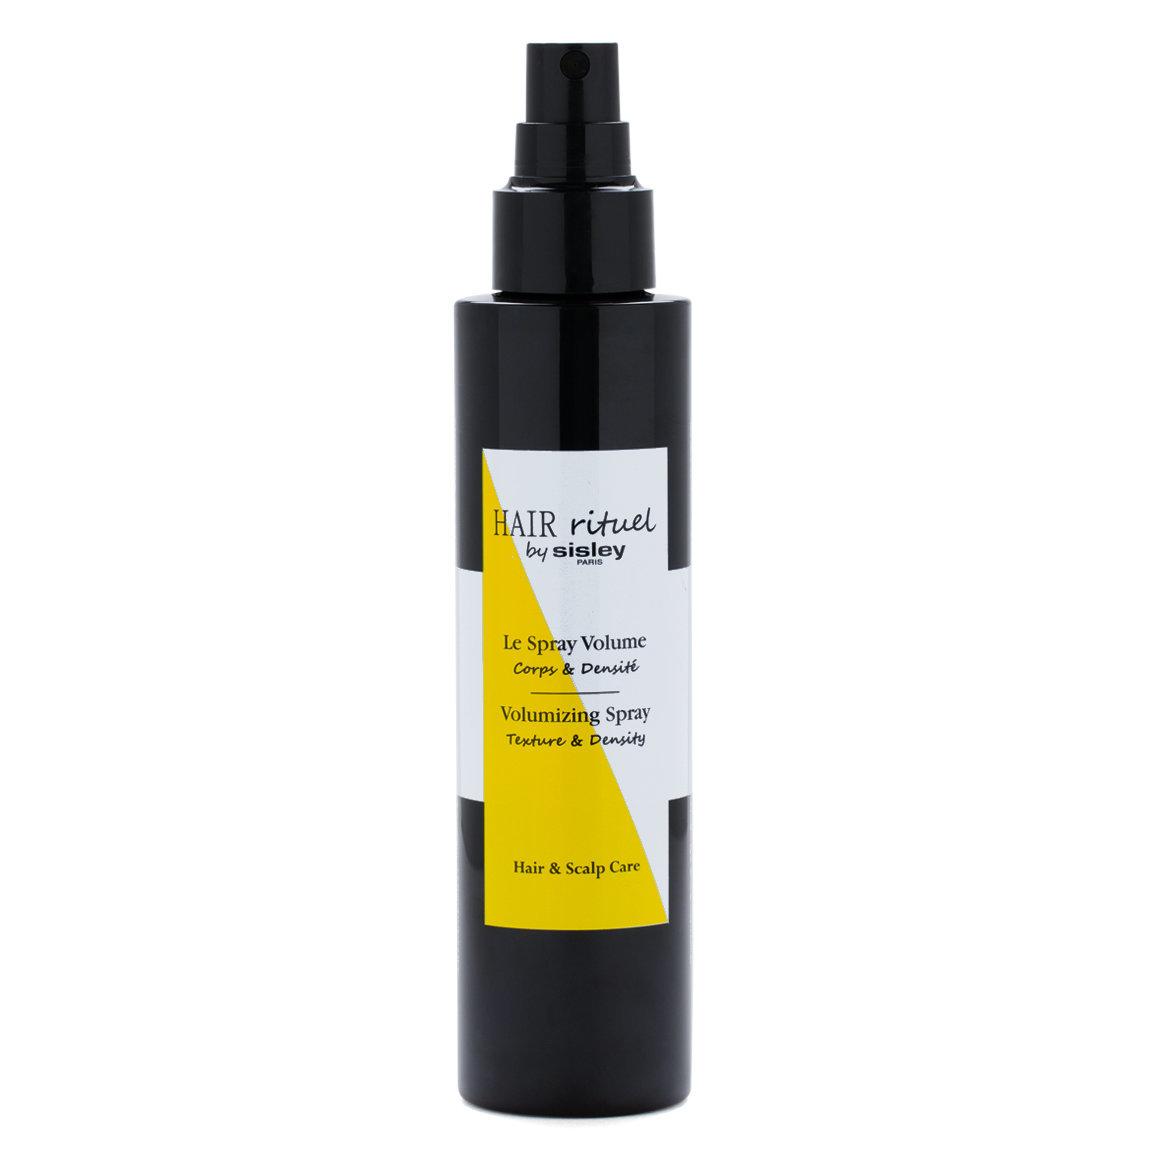 Sisley-Paris Volumizing Spray alternative view 1 - product swatch.